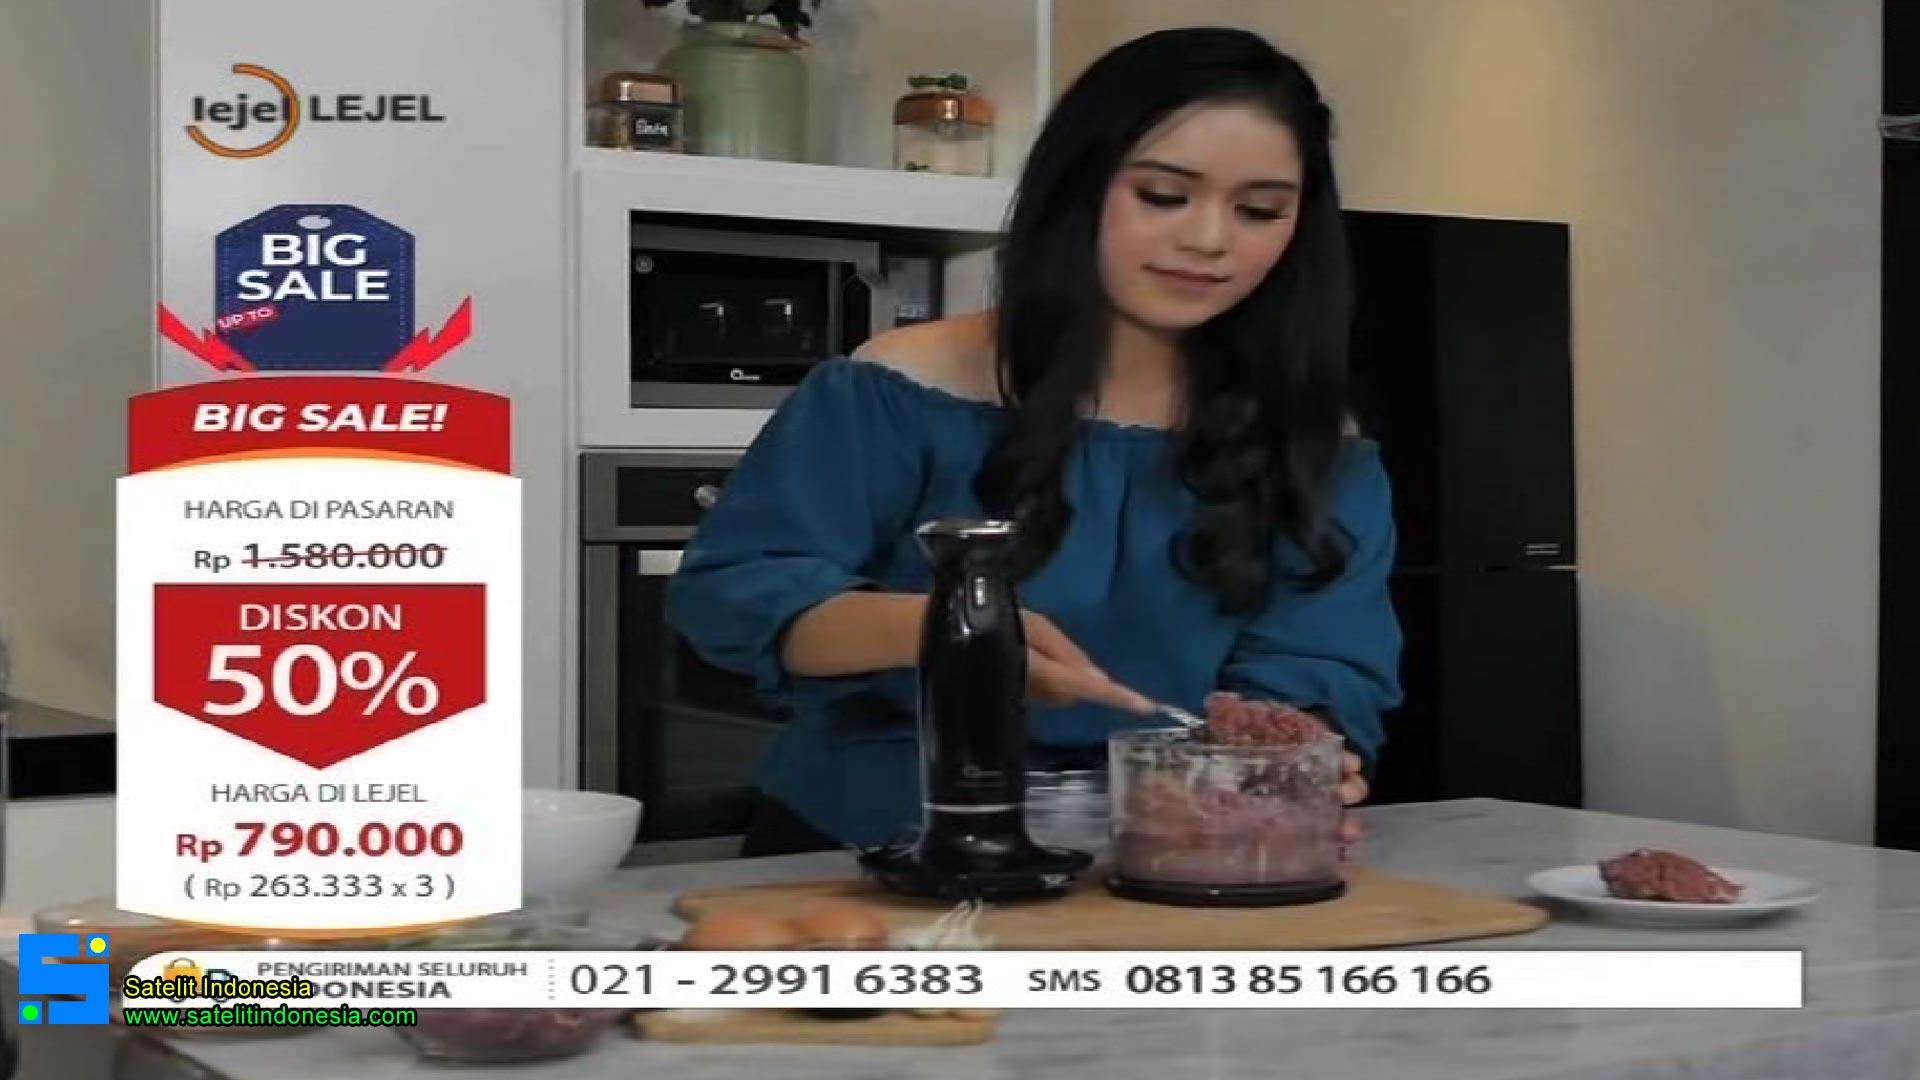 Frekuensi siaran Lejel Home Shopping di satelit Palapa D Terbaru